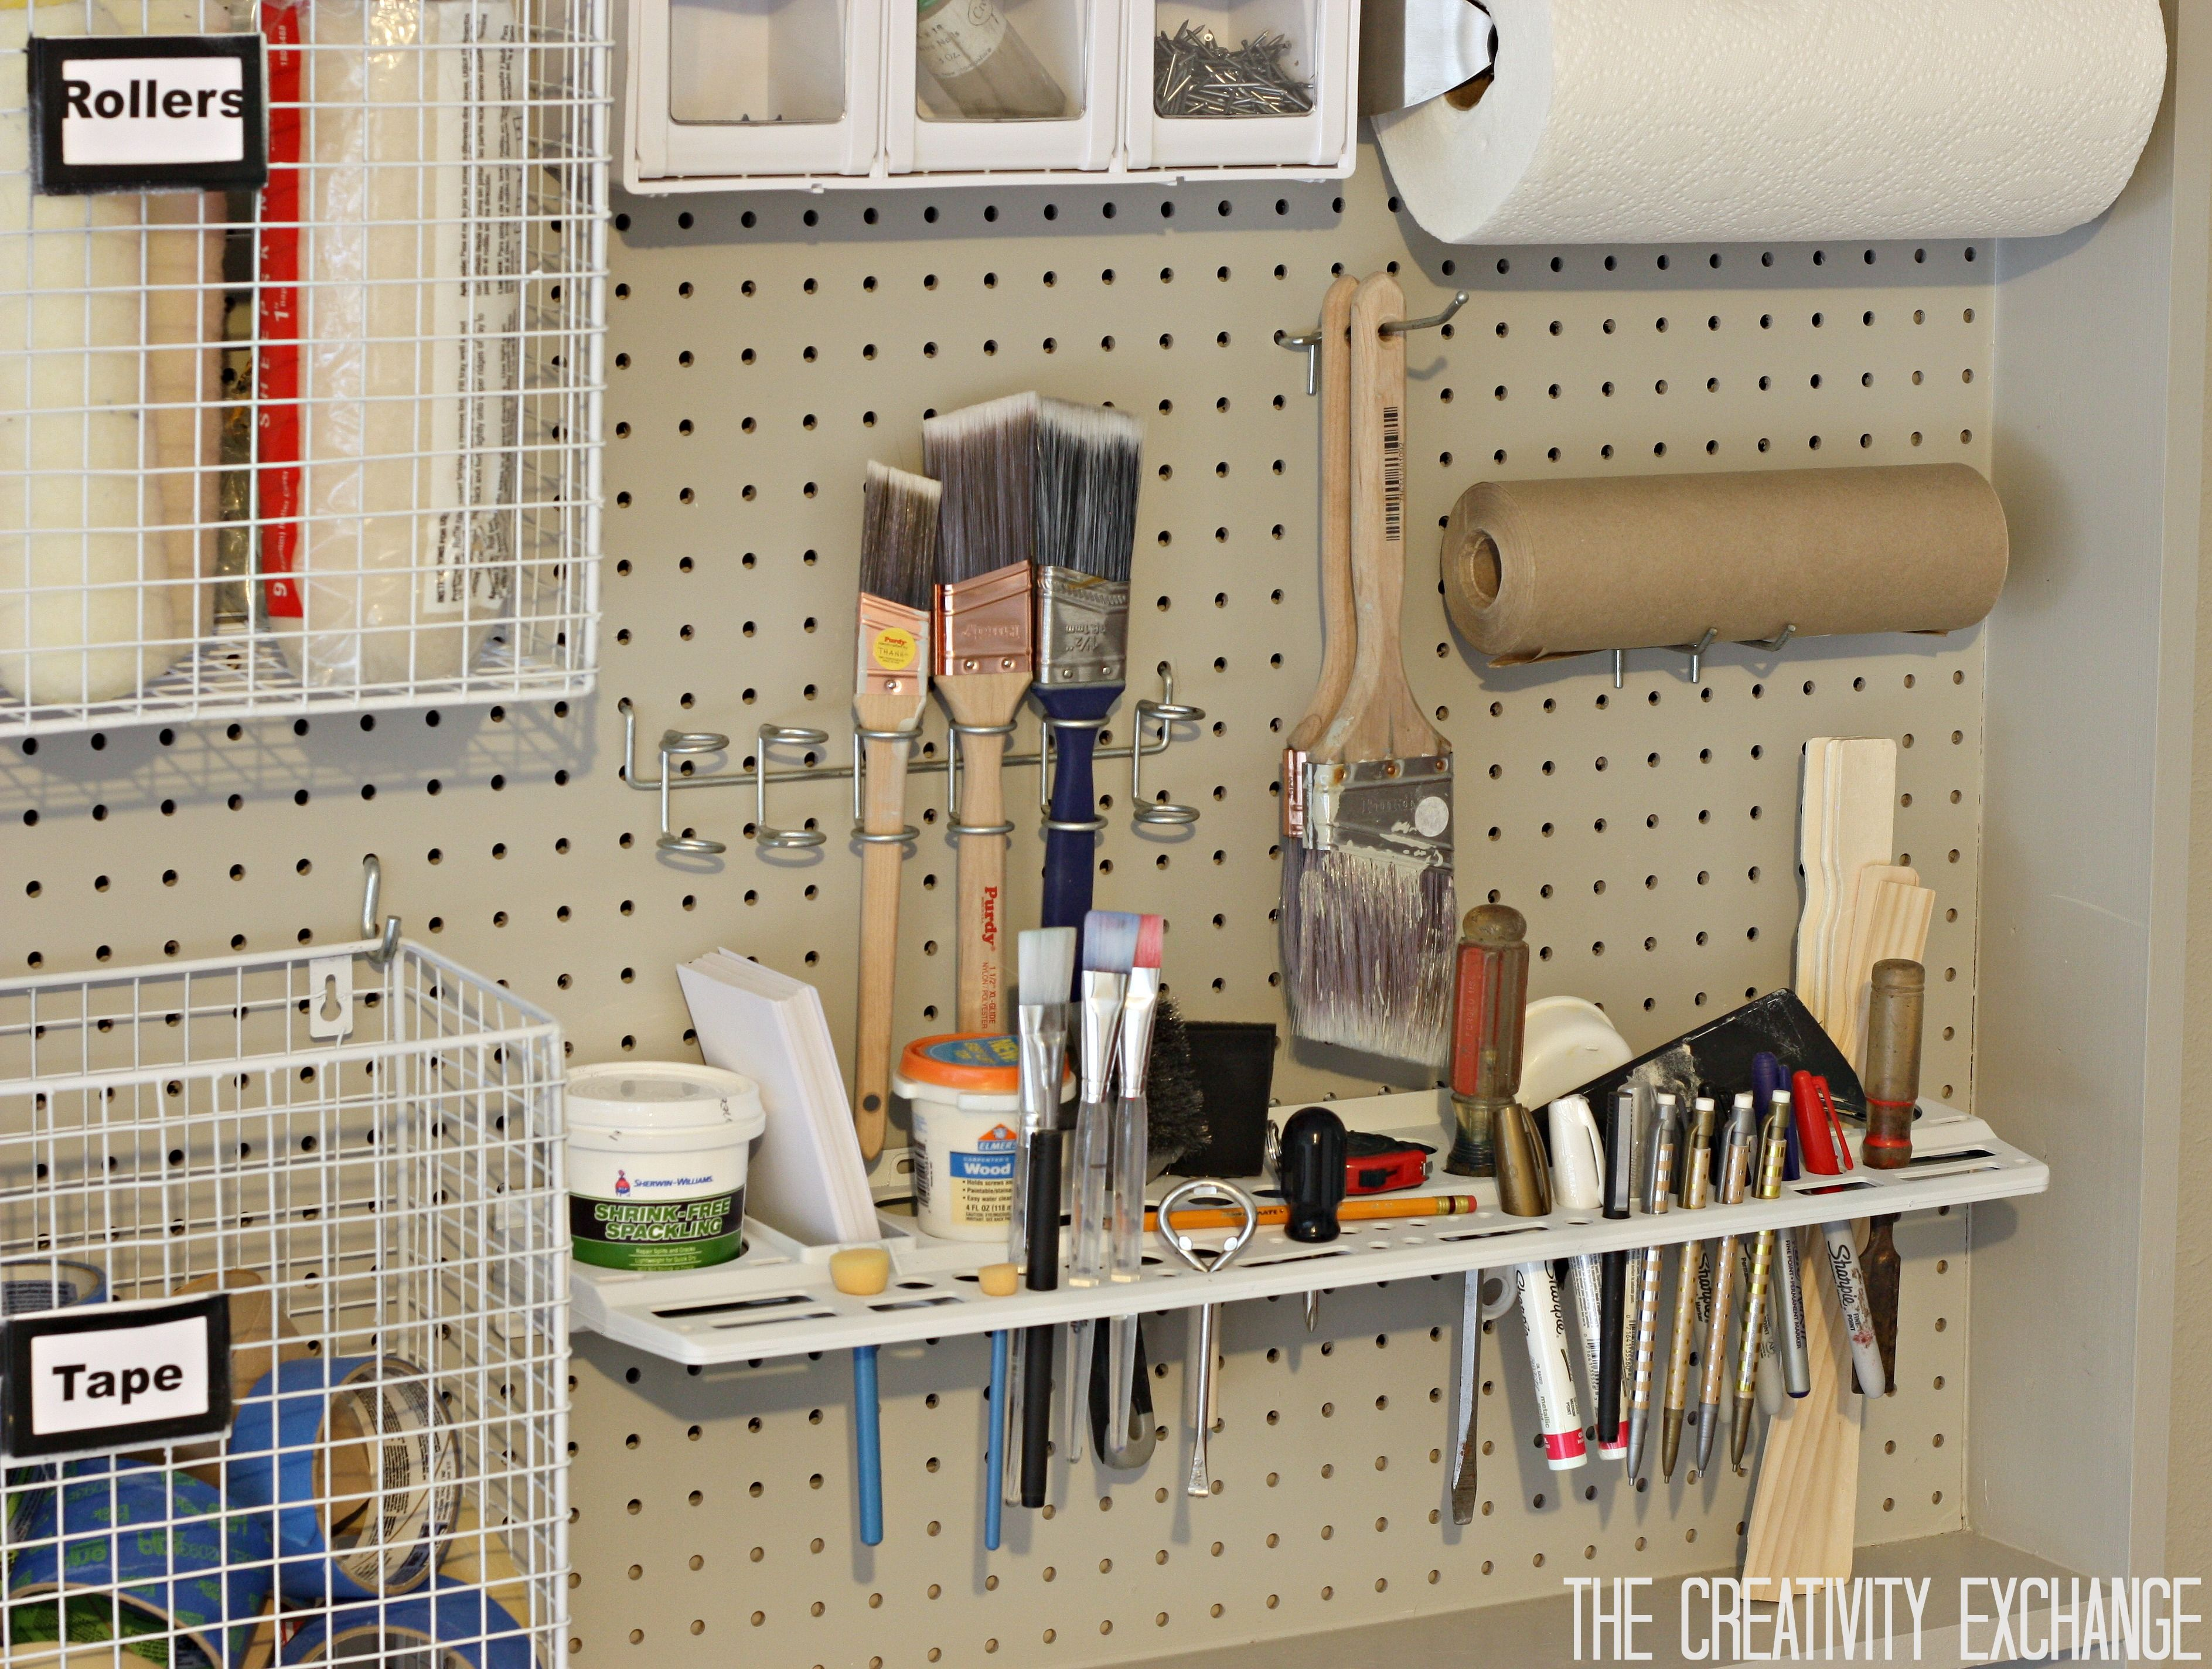 Organizing The Garage With Diy Pegboard Storage Wall Pegboard Storage Home Depot Garage Storage Storage Room Organization